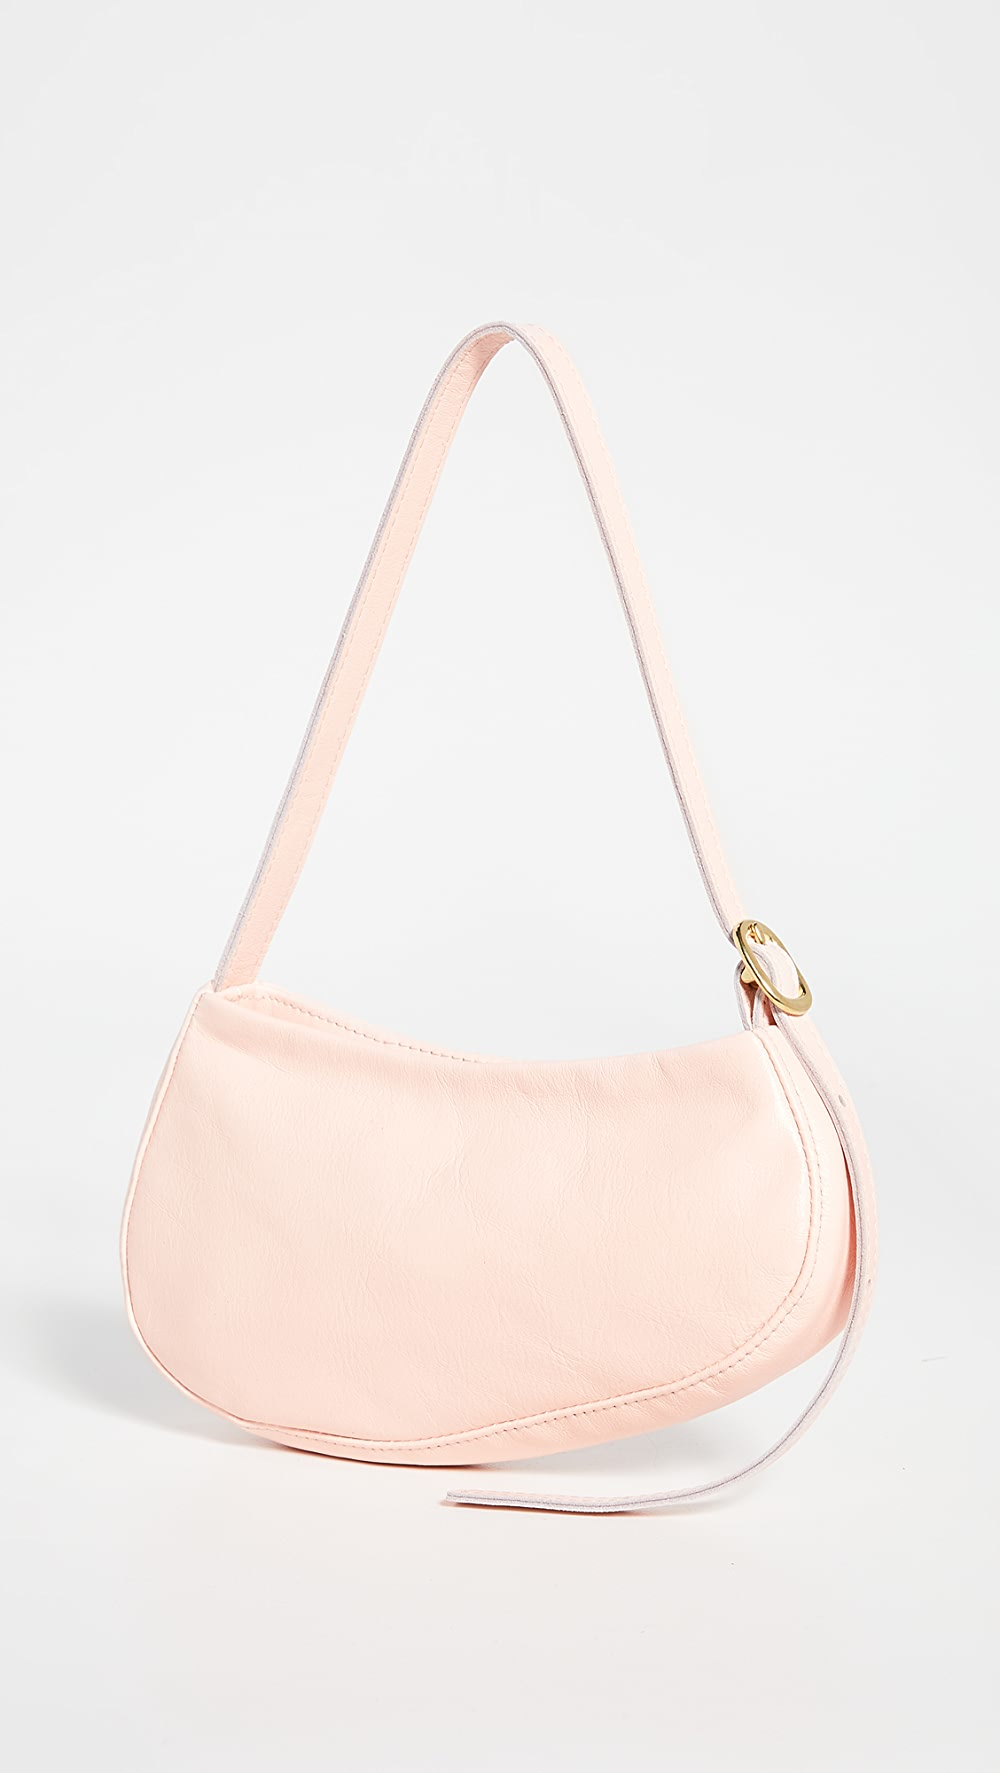 New Fashion Georgia Jay - Bean Baguette Bag Durable In Use